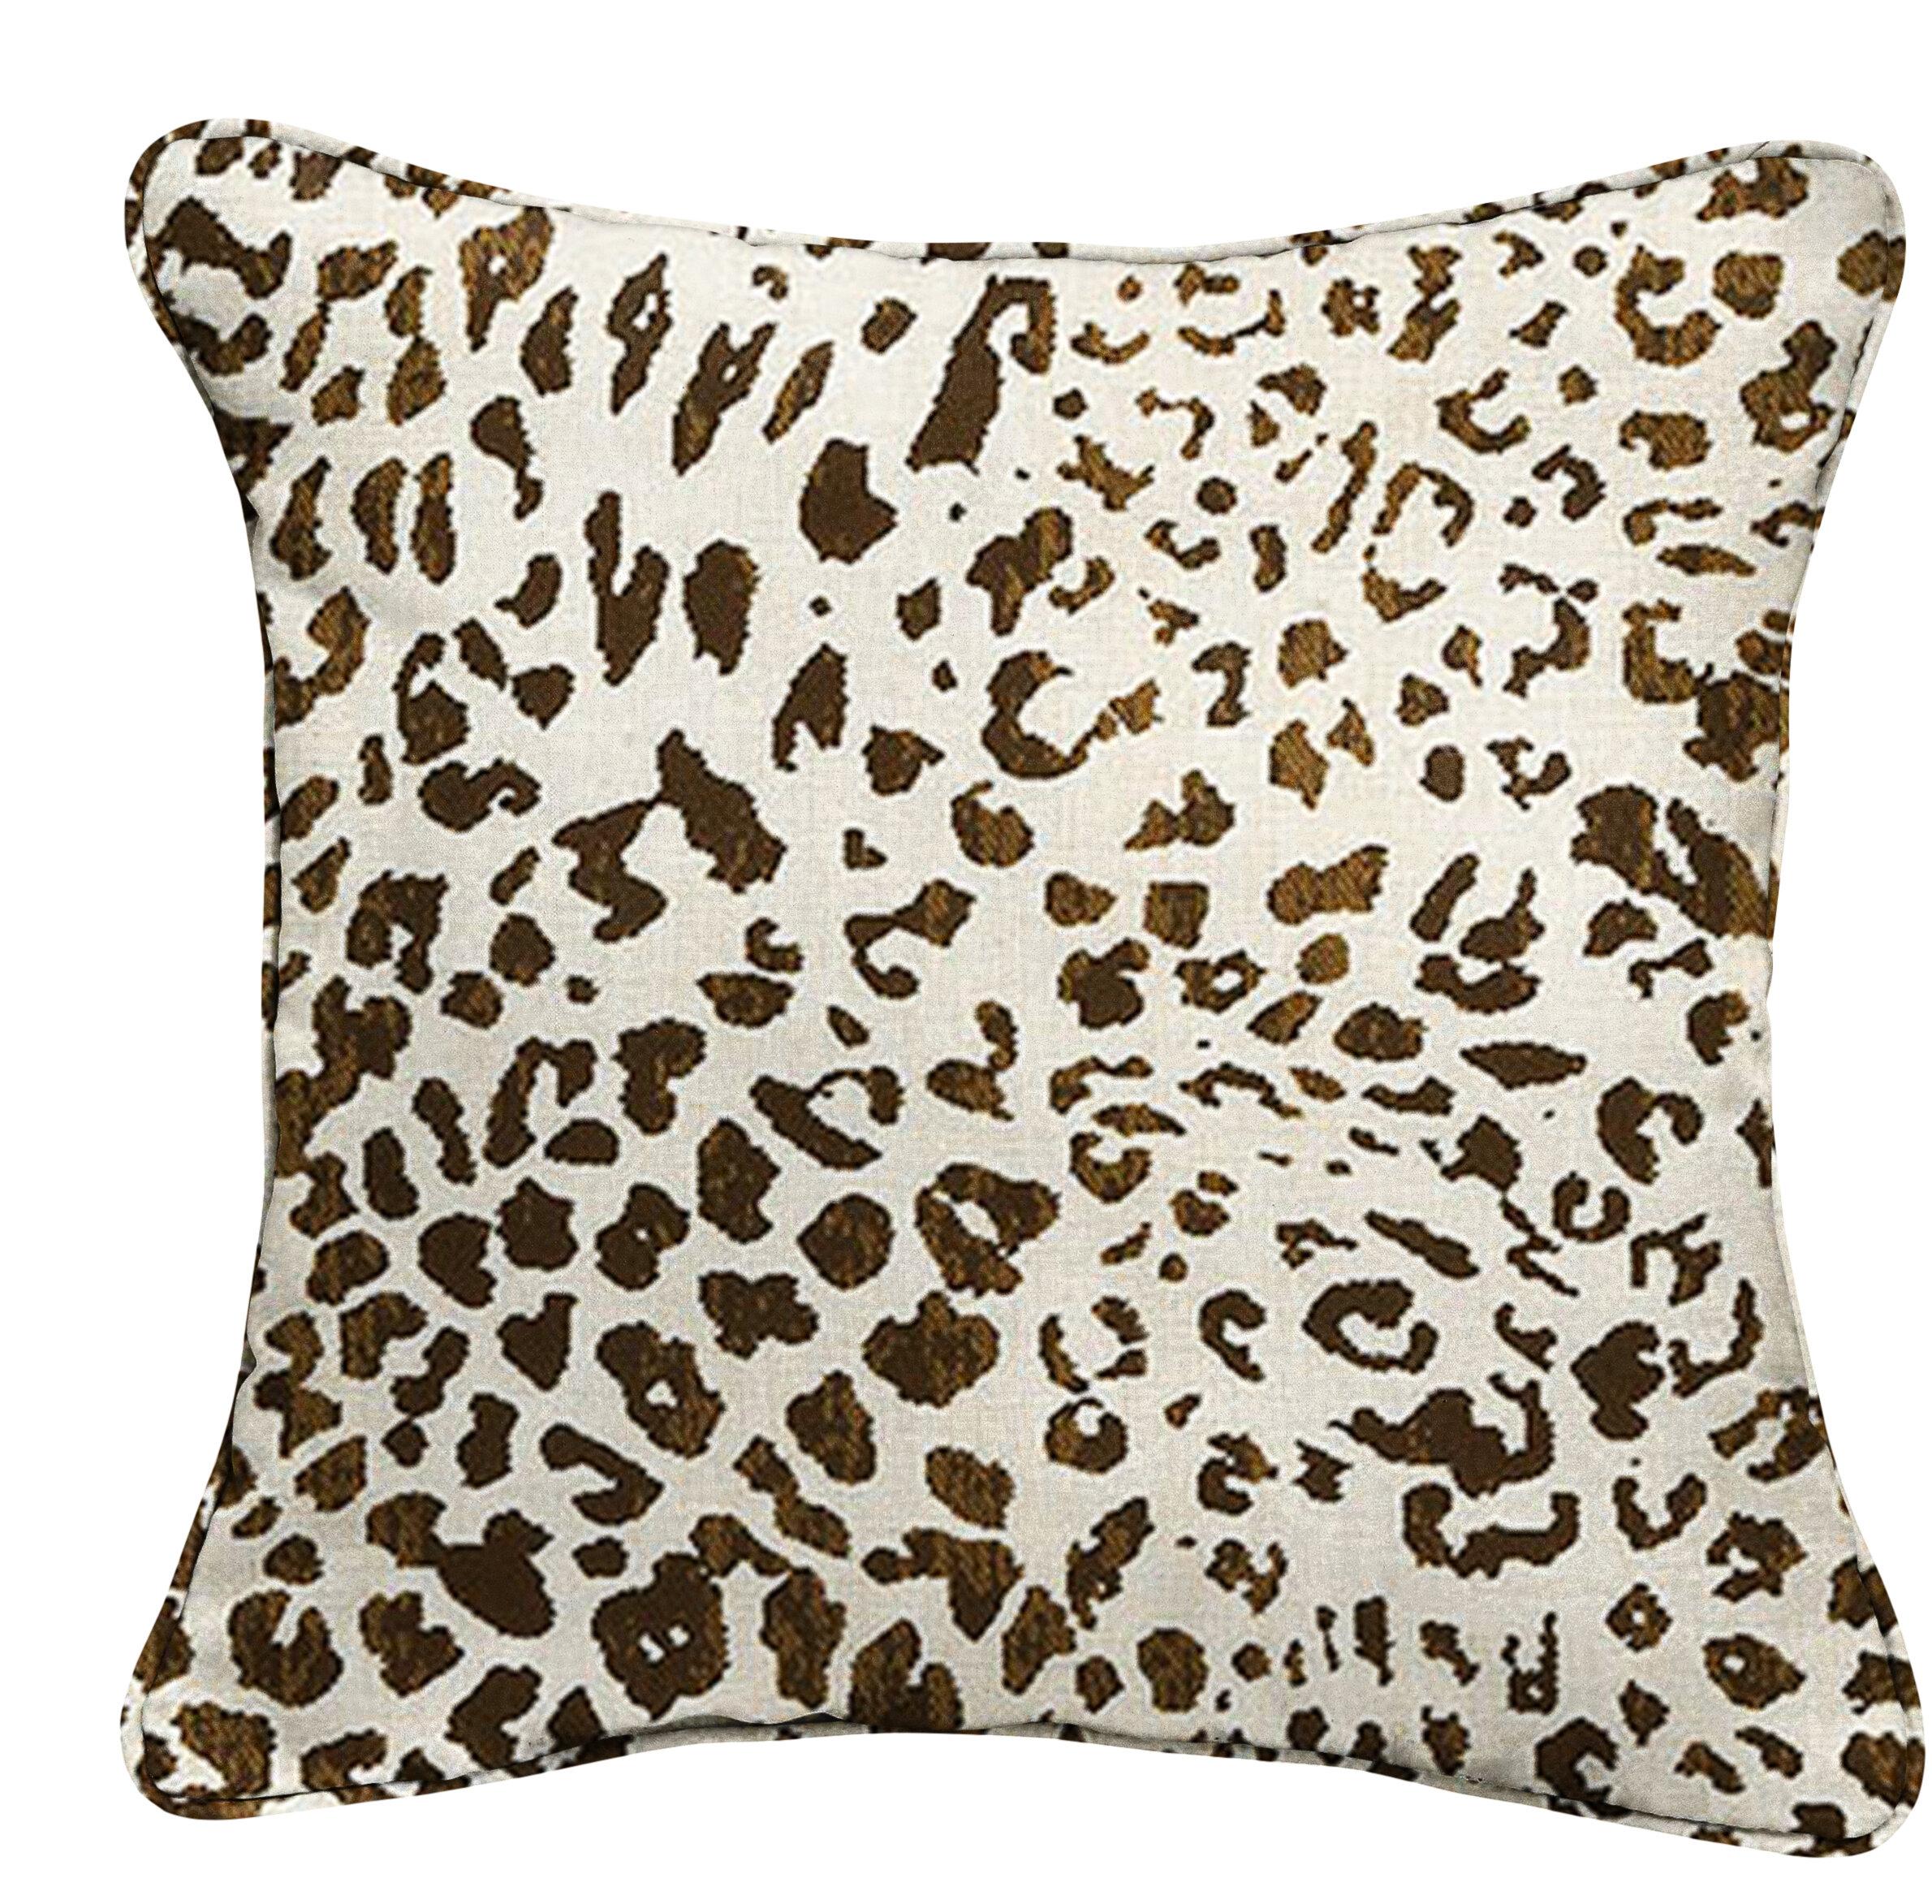 Animals Wildlife Throw Pillows You Ll Love In 2021 Wayfair